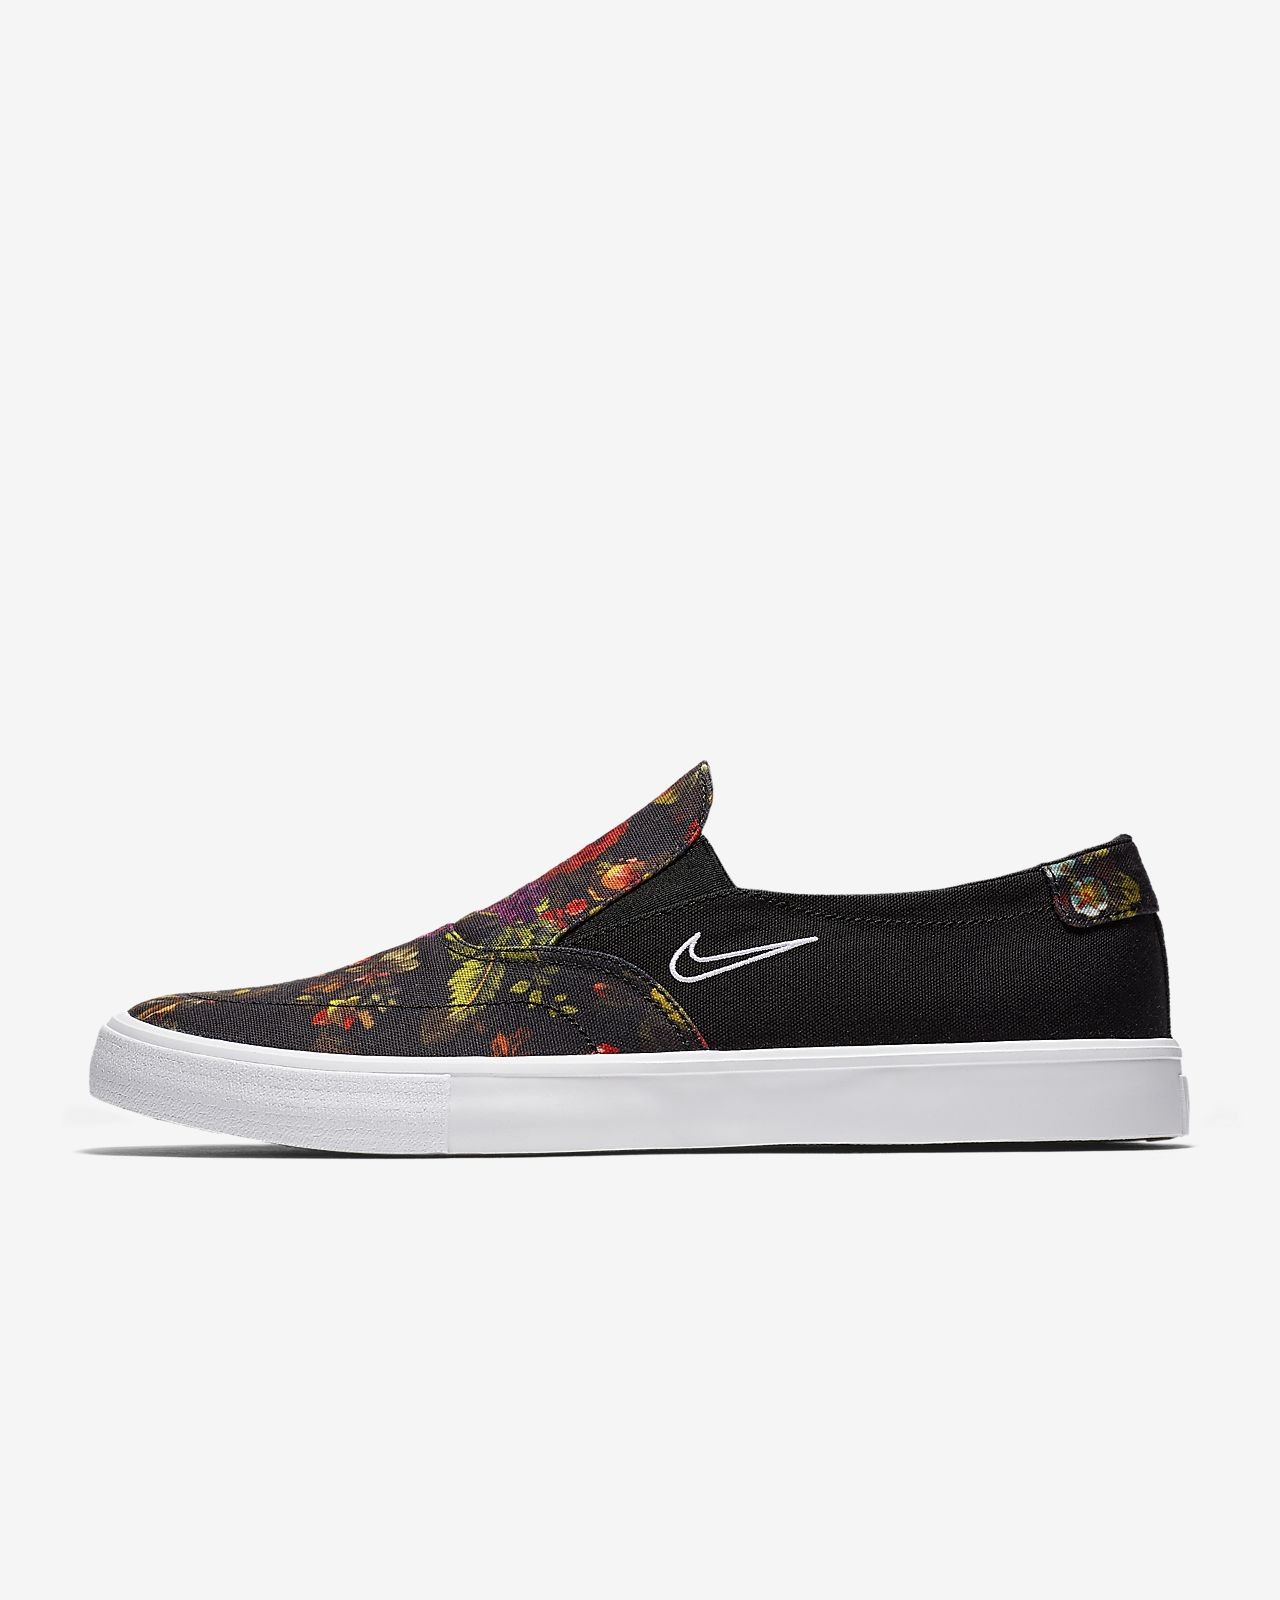 79b03c902a7d ... grey black white medium 8e544 678d3 discount nike sb portmore ii  solarsoft slip on mens skateboarding shoe eb114 7191f ...